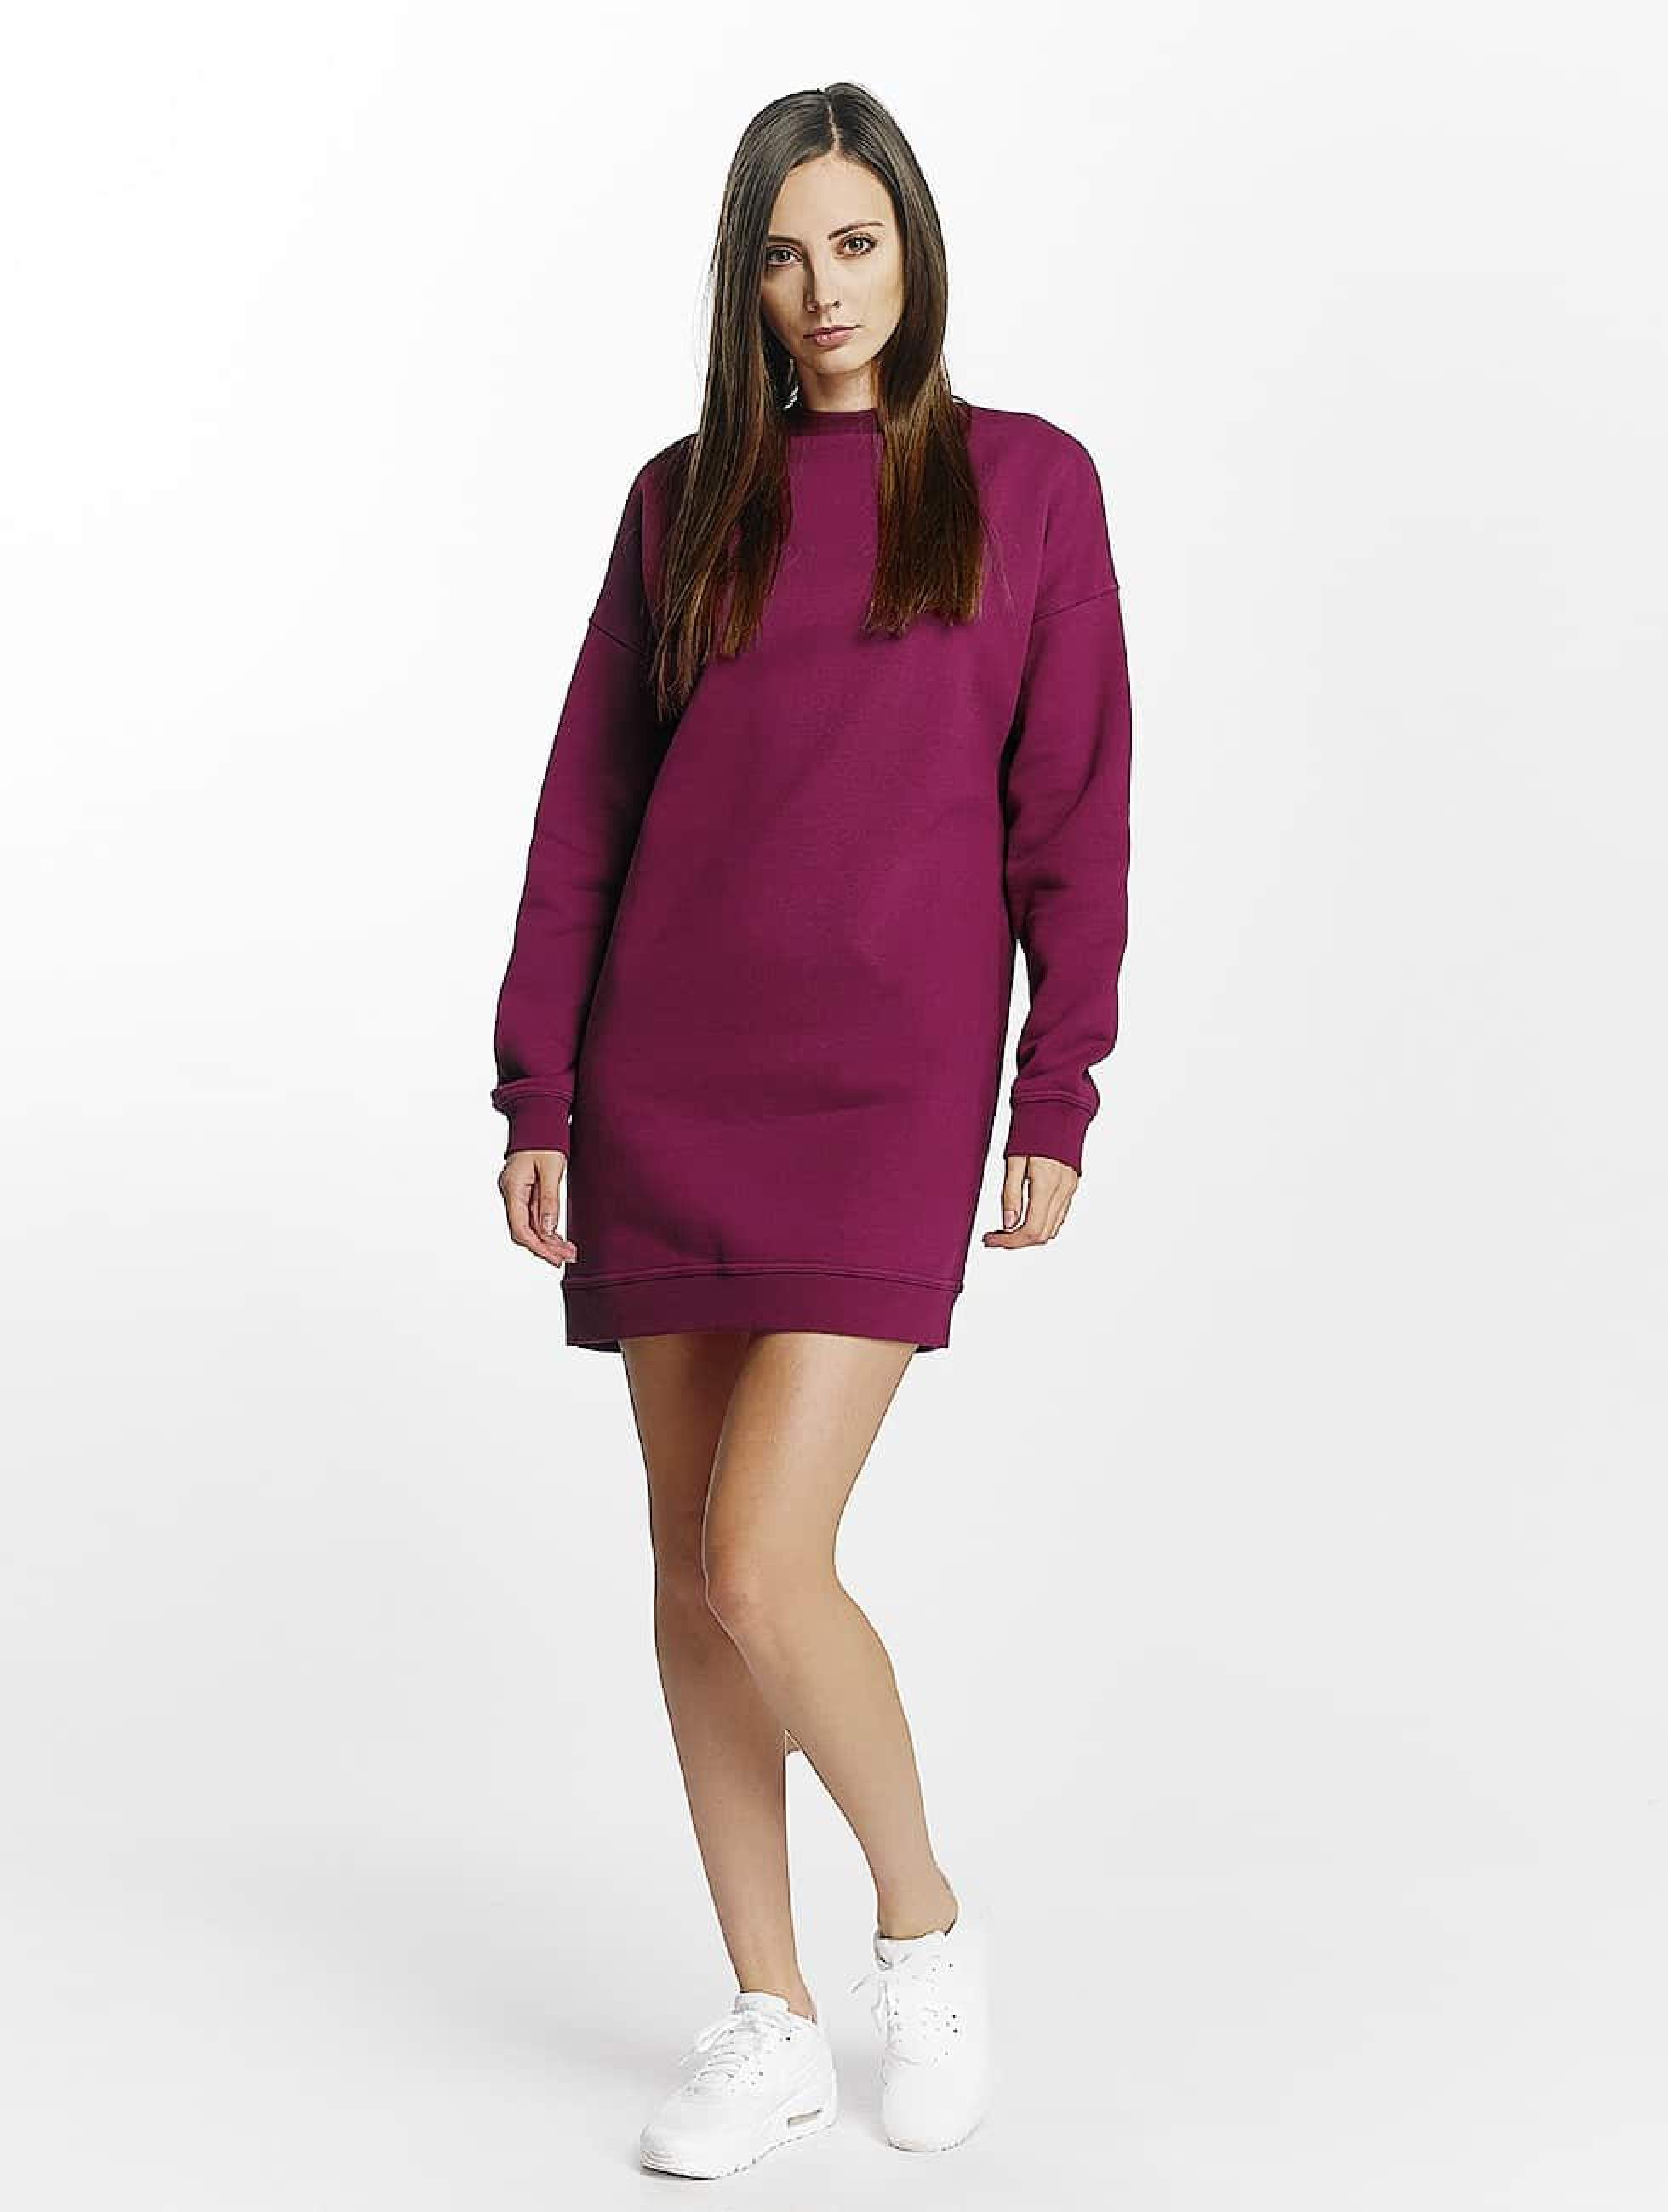 Cyprime / Dress Titanium in red S